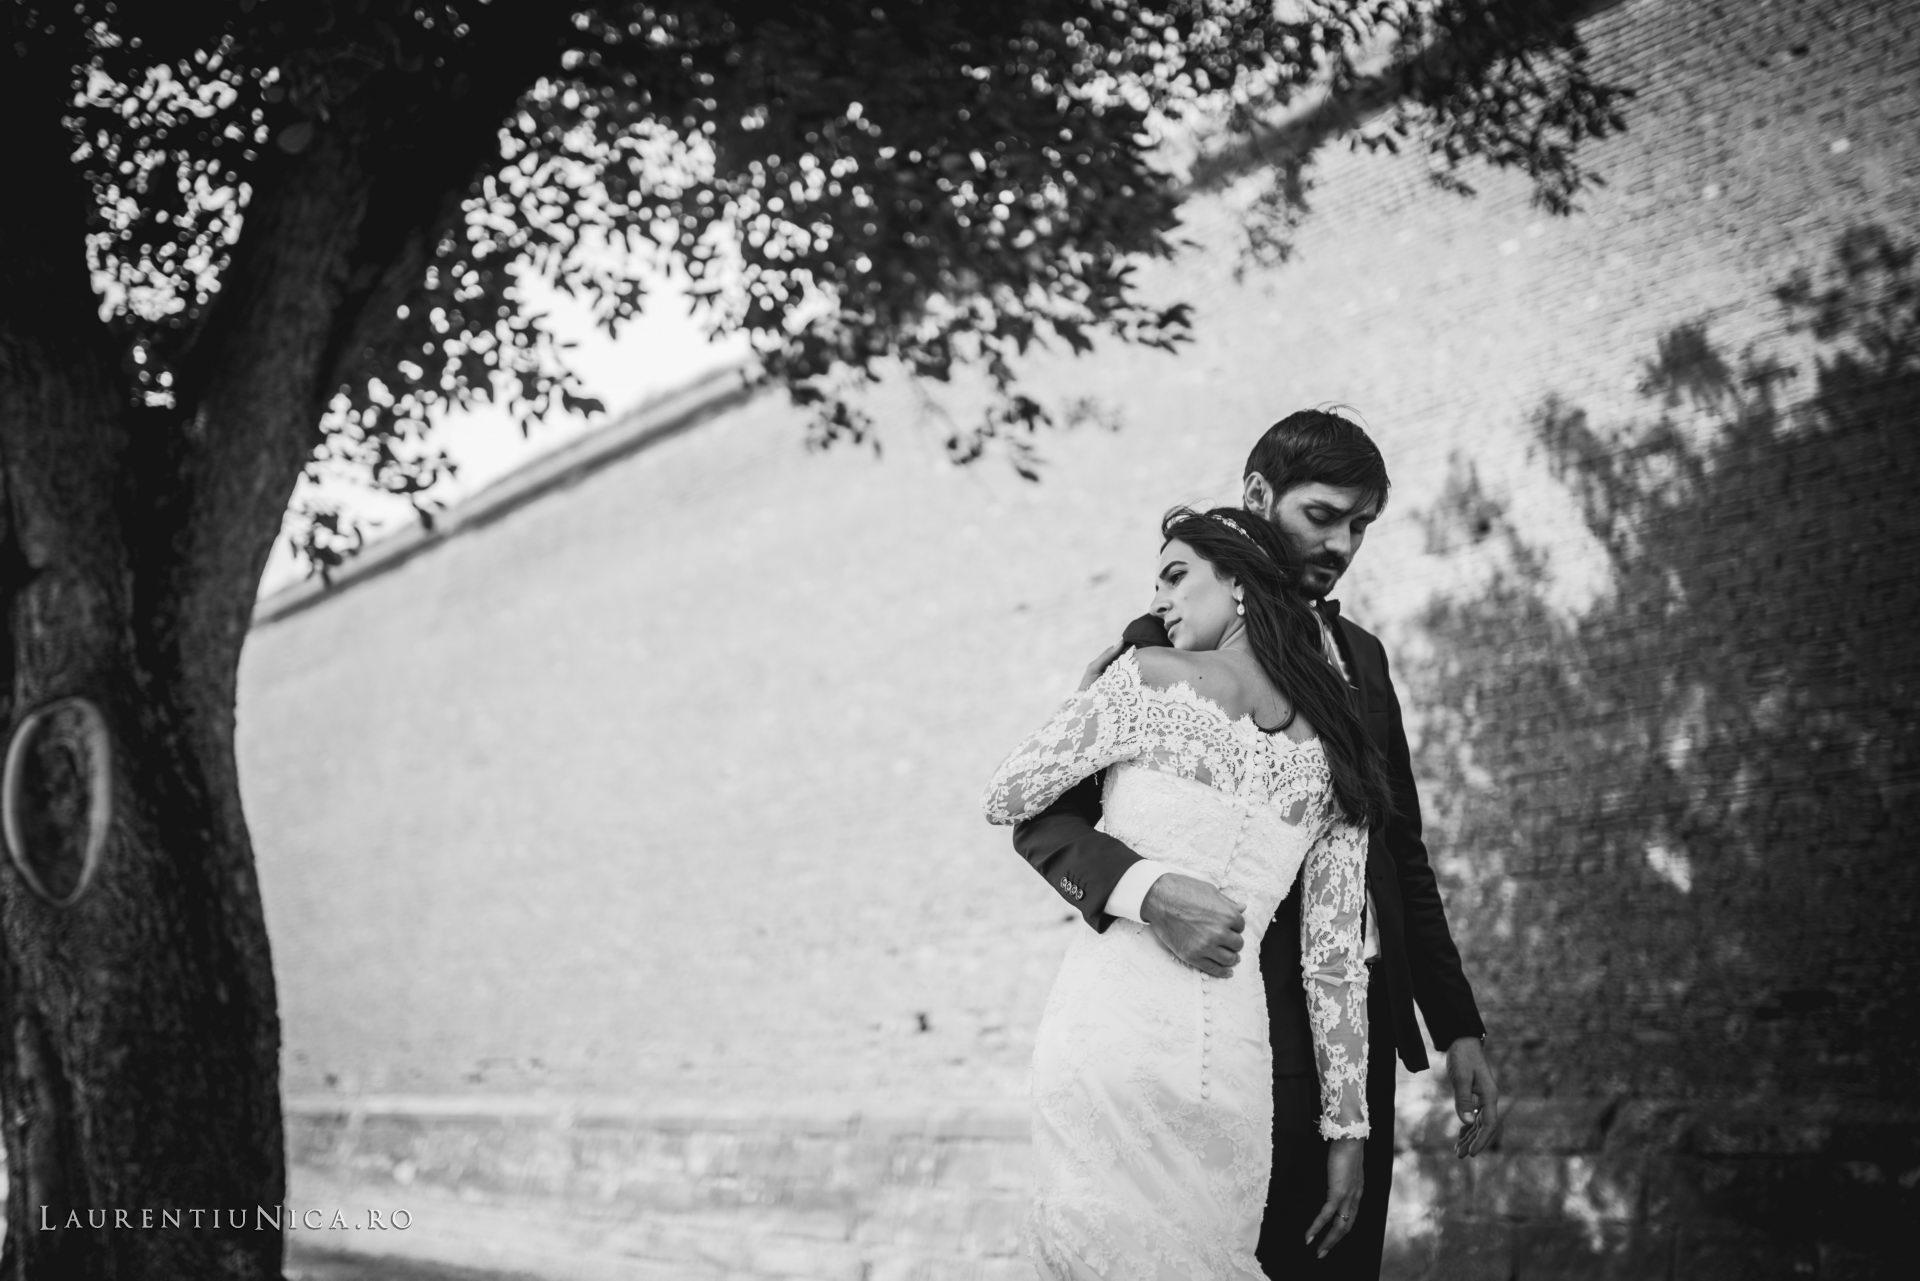 cristina_si_ovidiu-after-wedding-alba-iulia_fotograf_laurentiu_nica_45